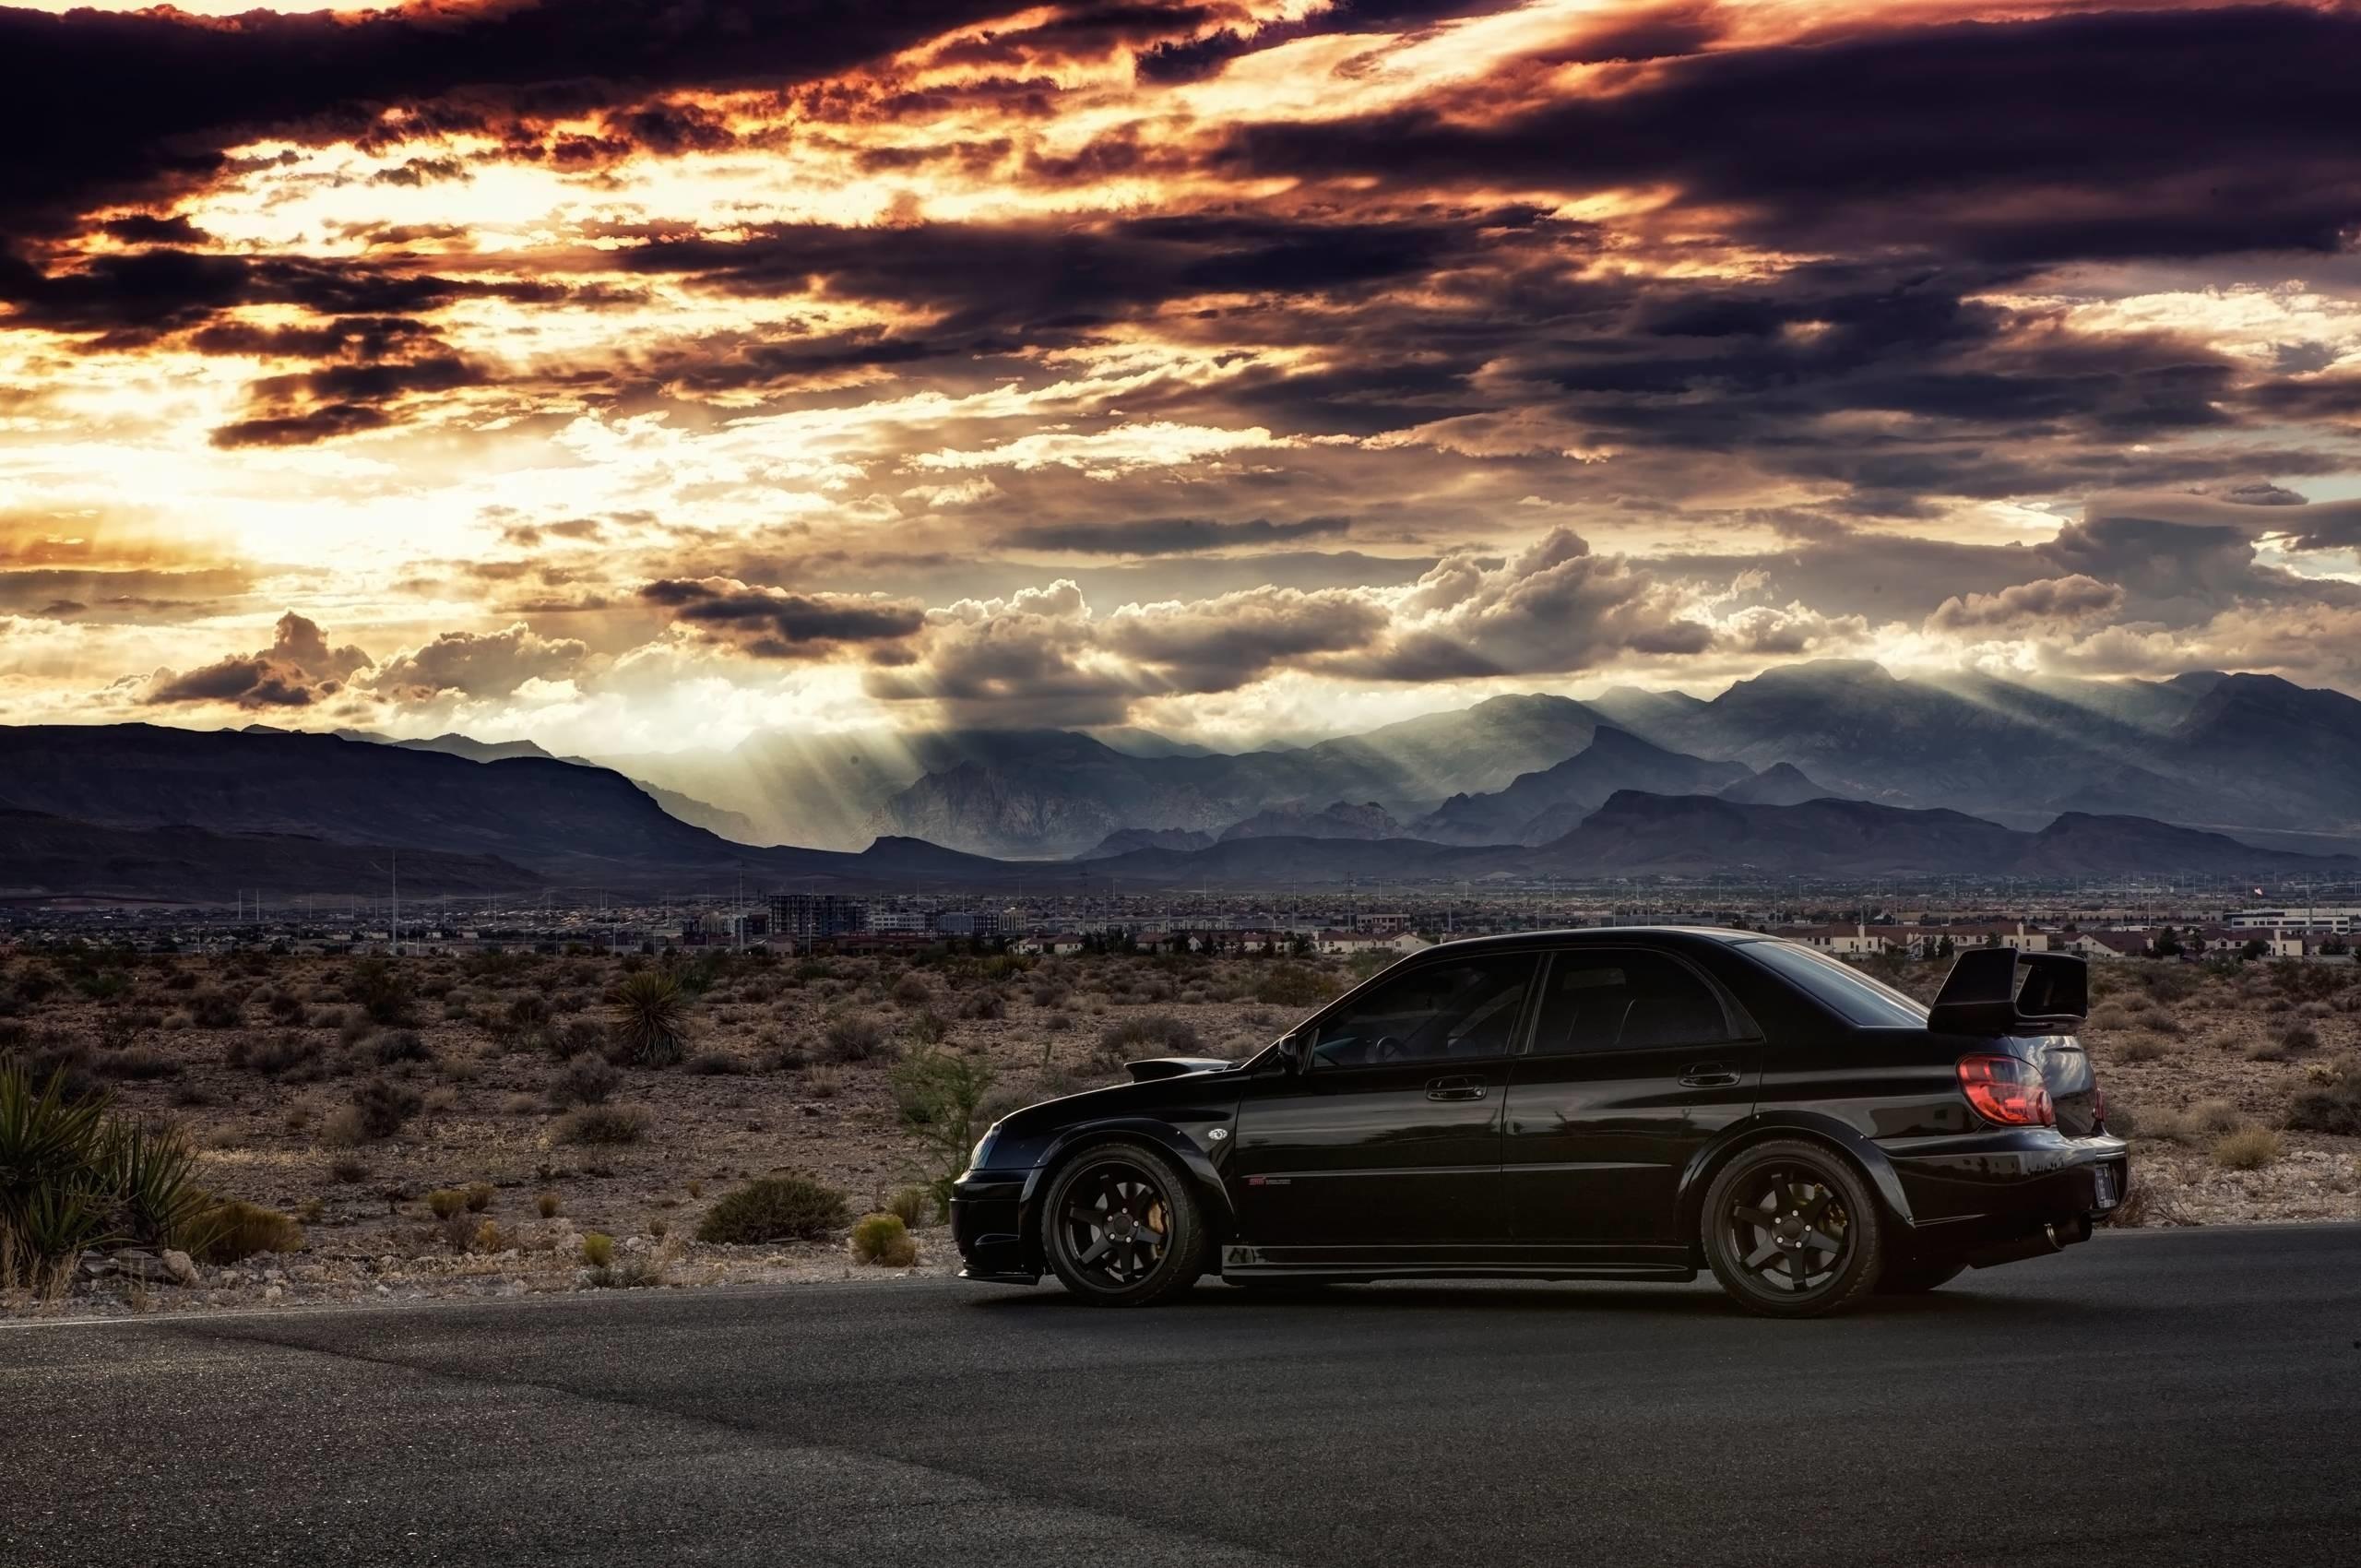 Res: 2560x1700, 196 Subaru Wallpapers | Subaru Backgrounds